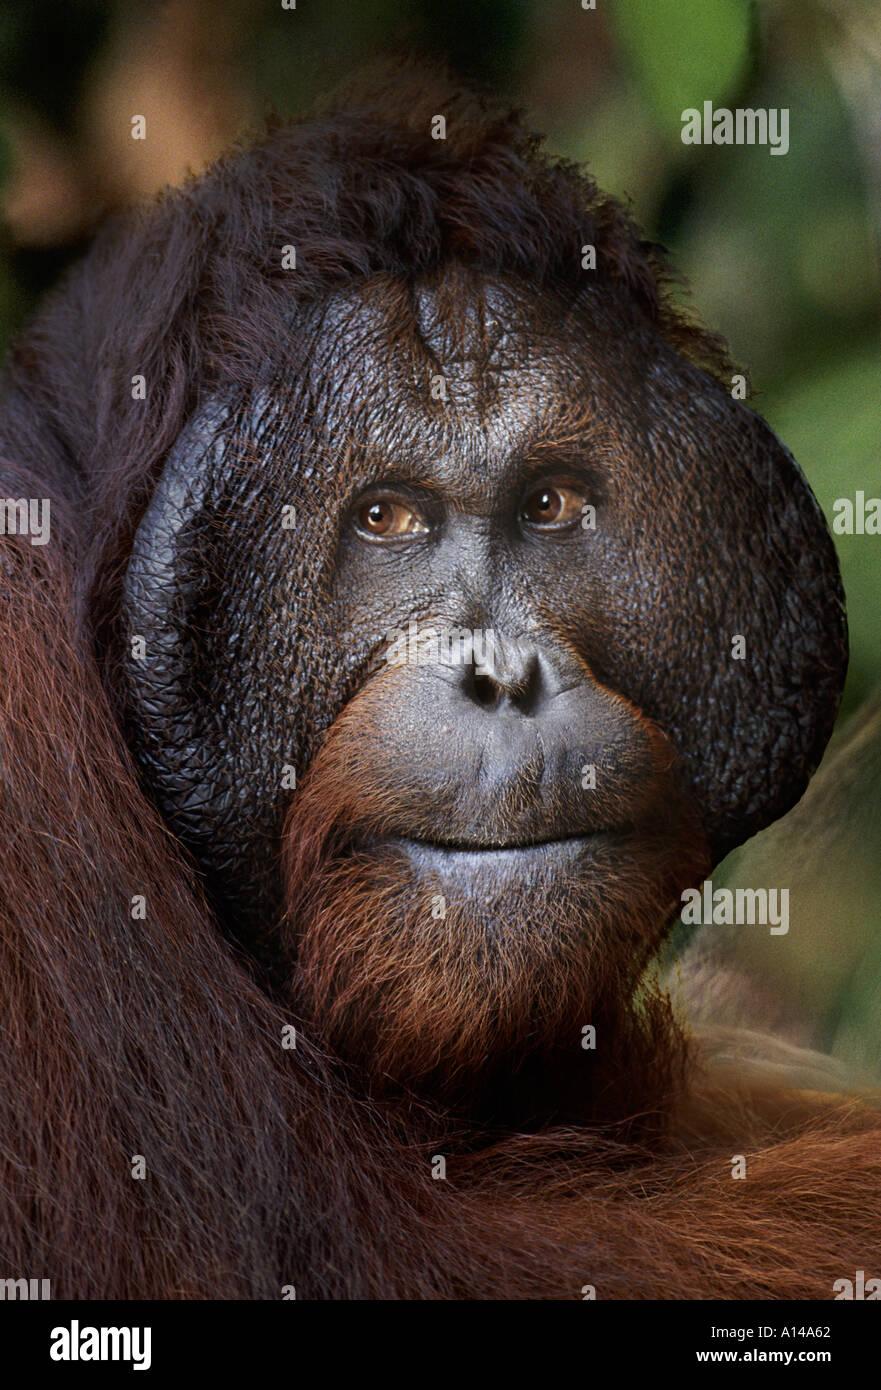 Mature Male Orangutan Tanjung Puting Borneo Stock Photo